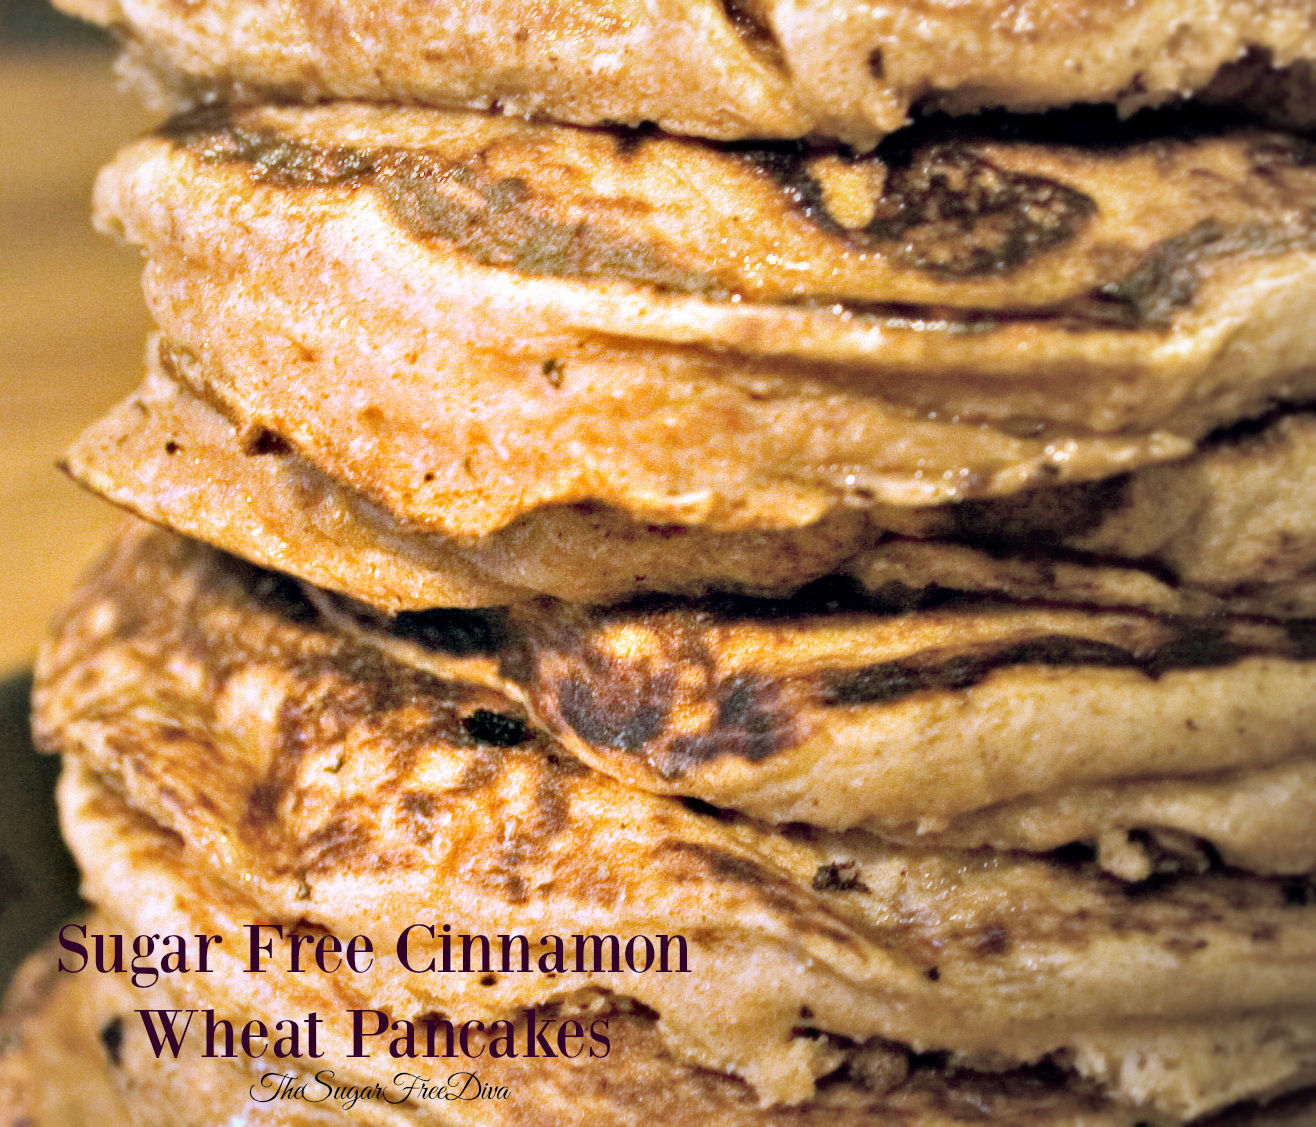 Sugar Free Cinnamon Wheat Pancakes